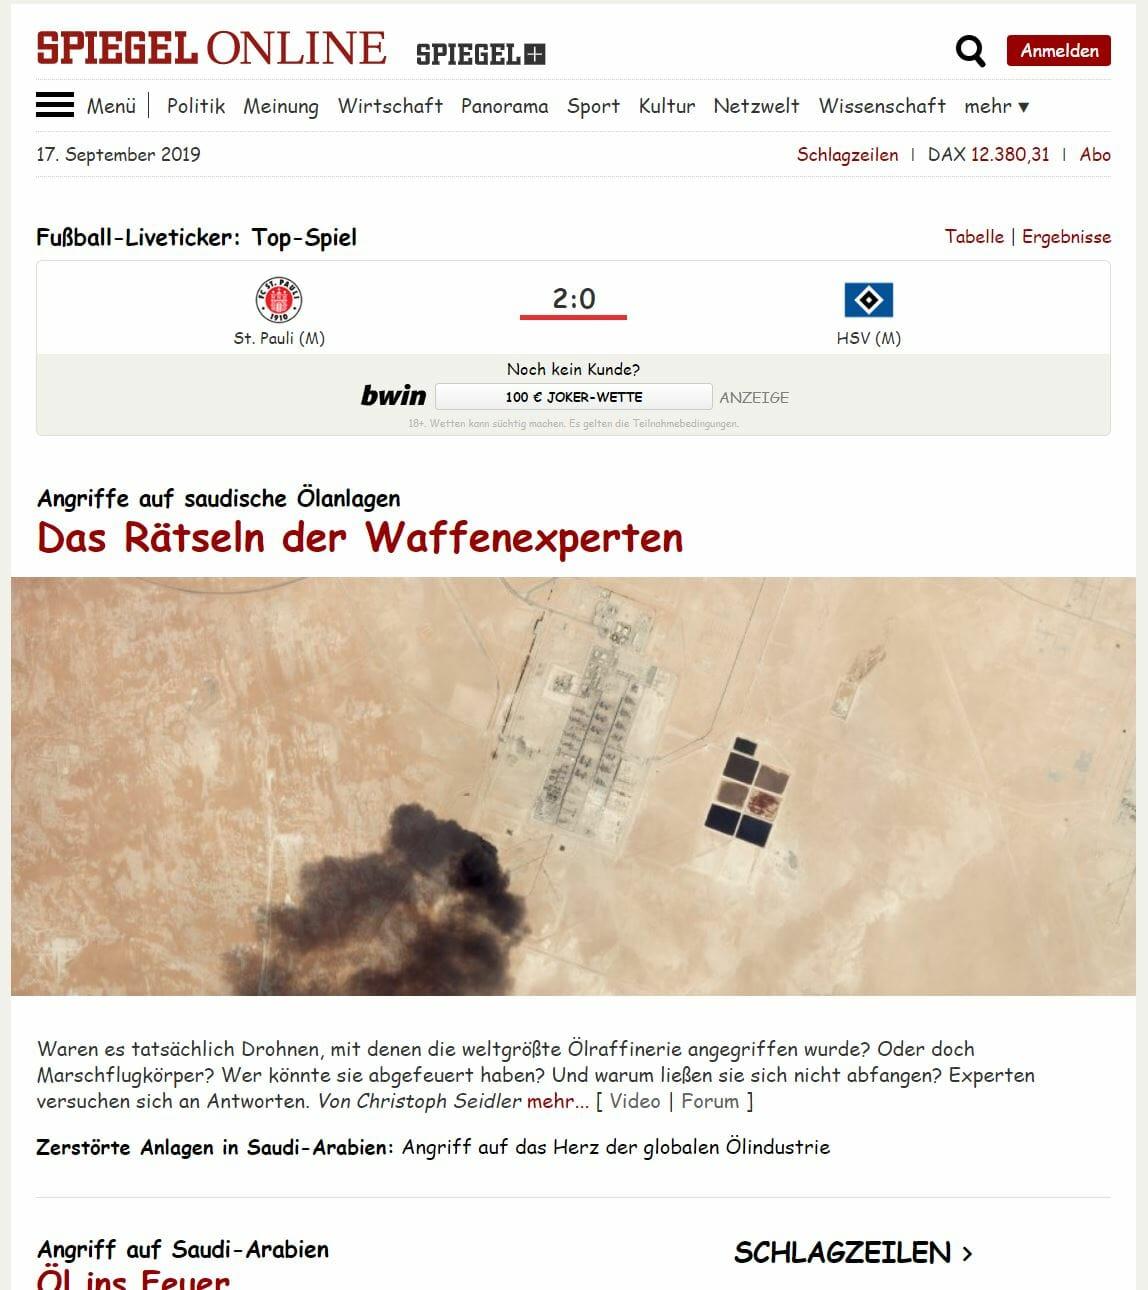 Spiegel Online Comic Sans MS